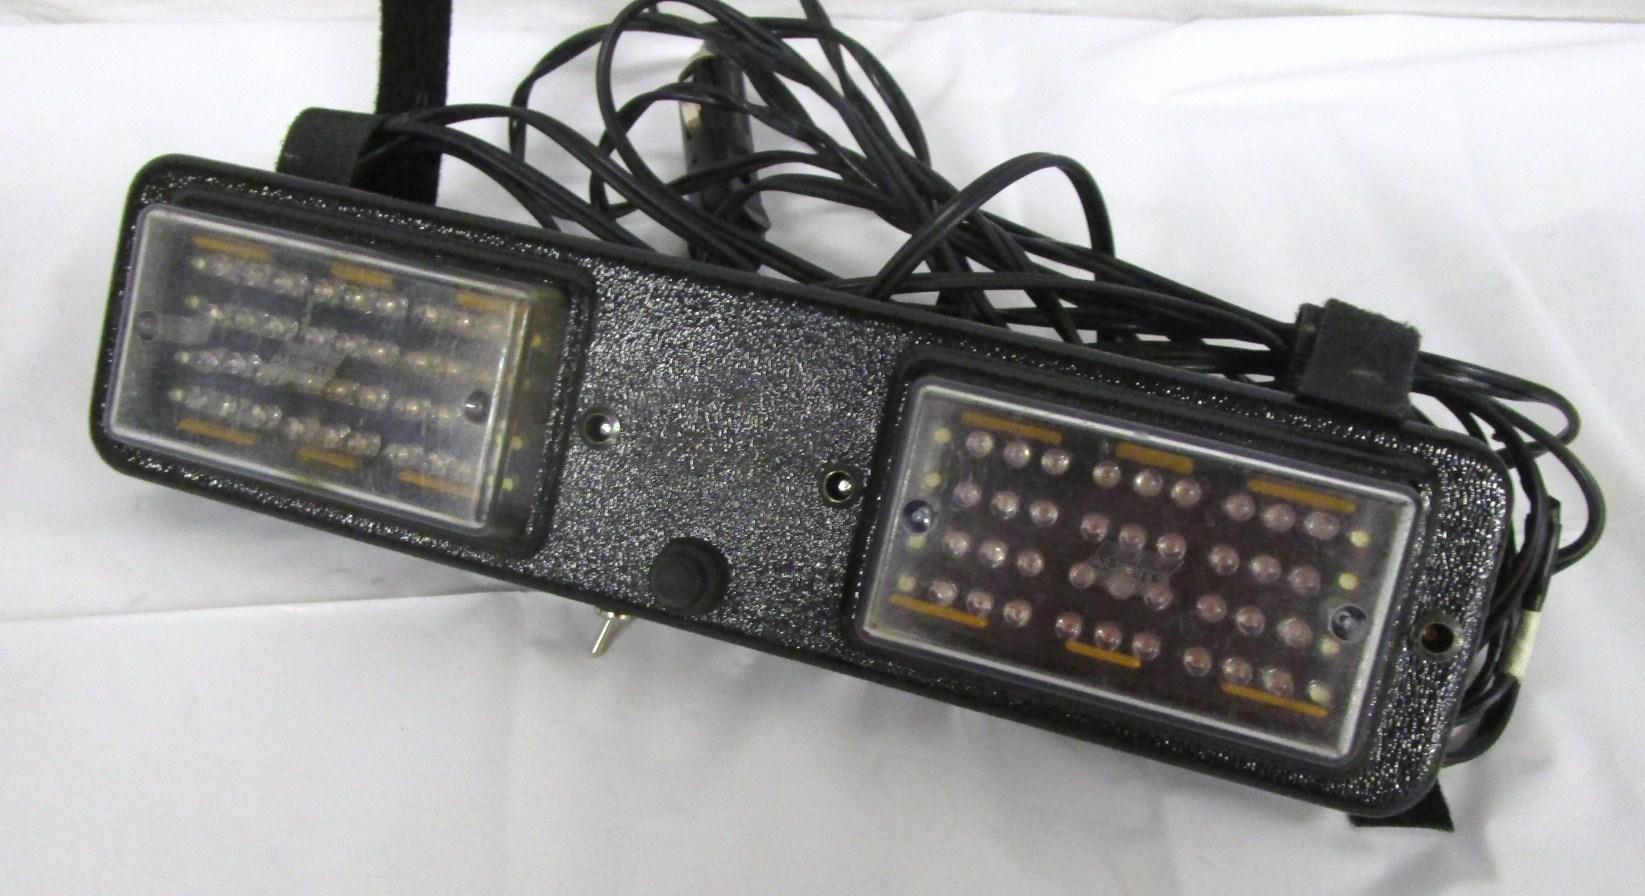 Off-camera police light